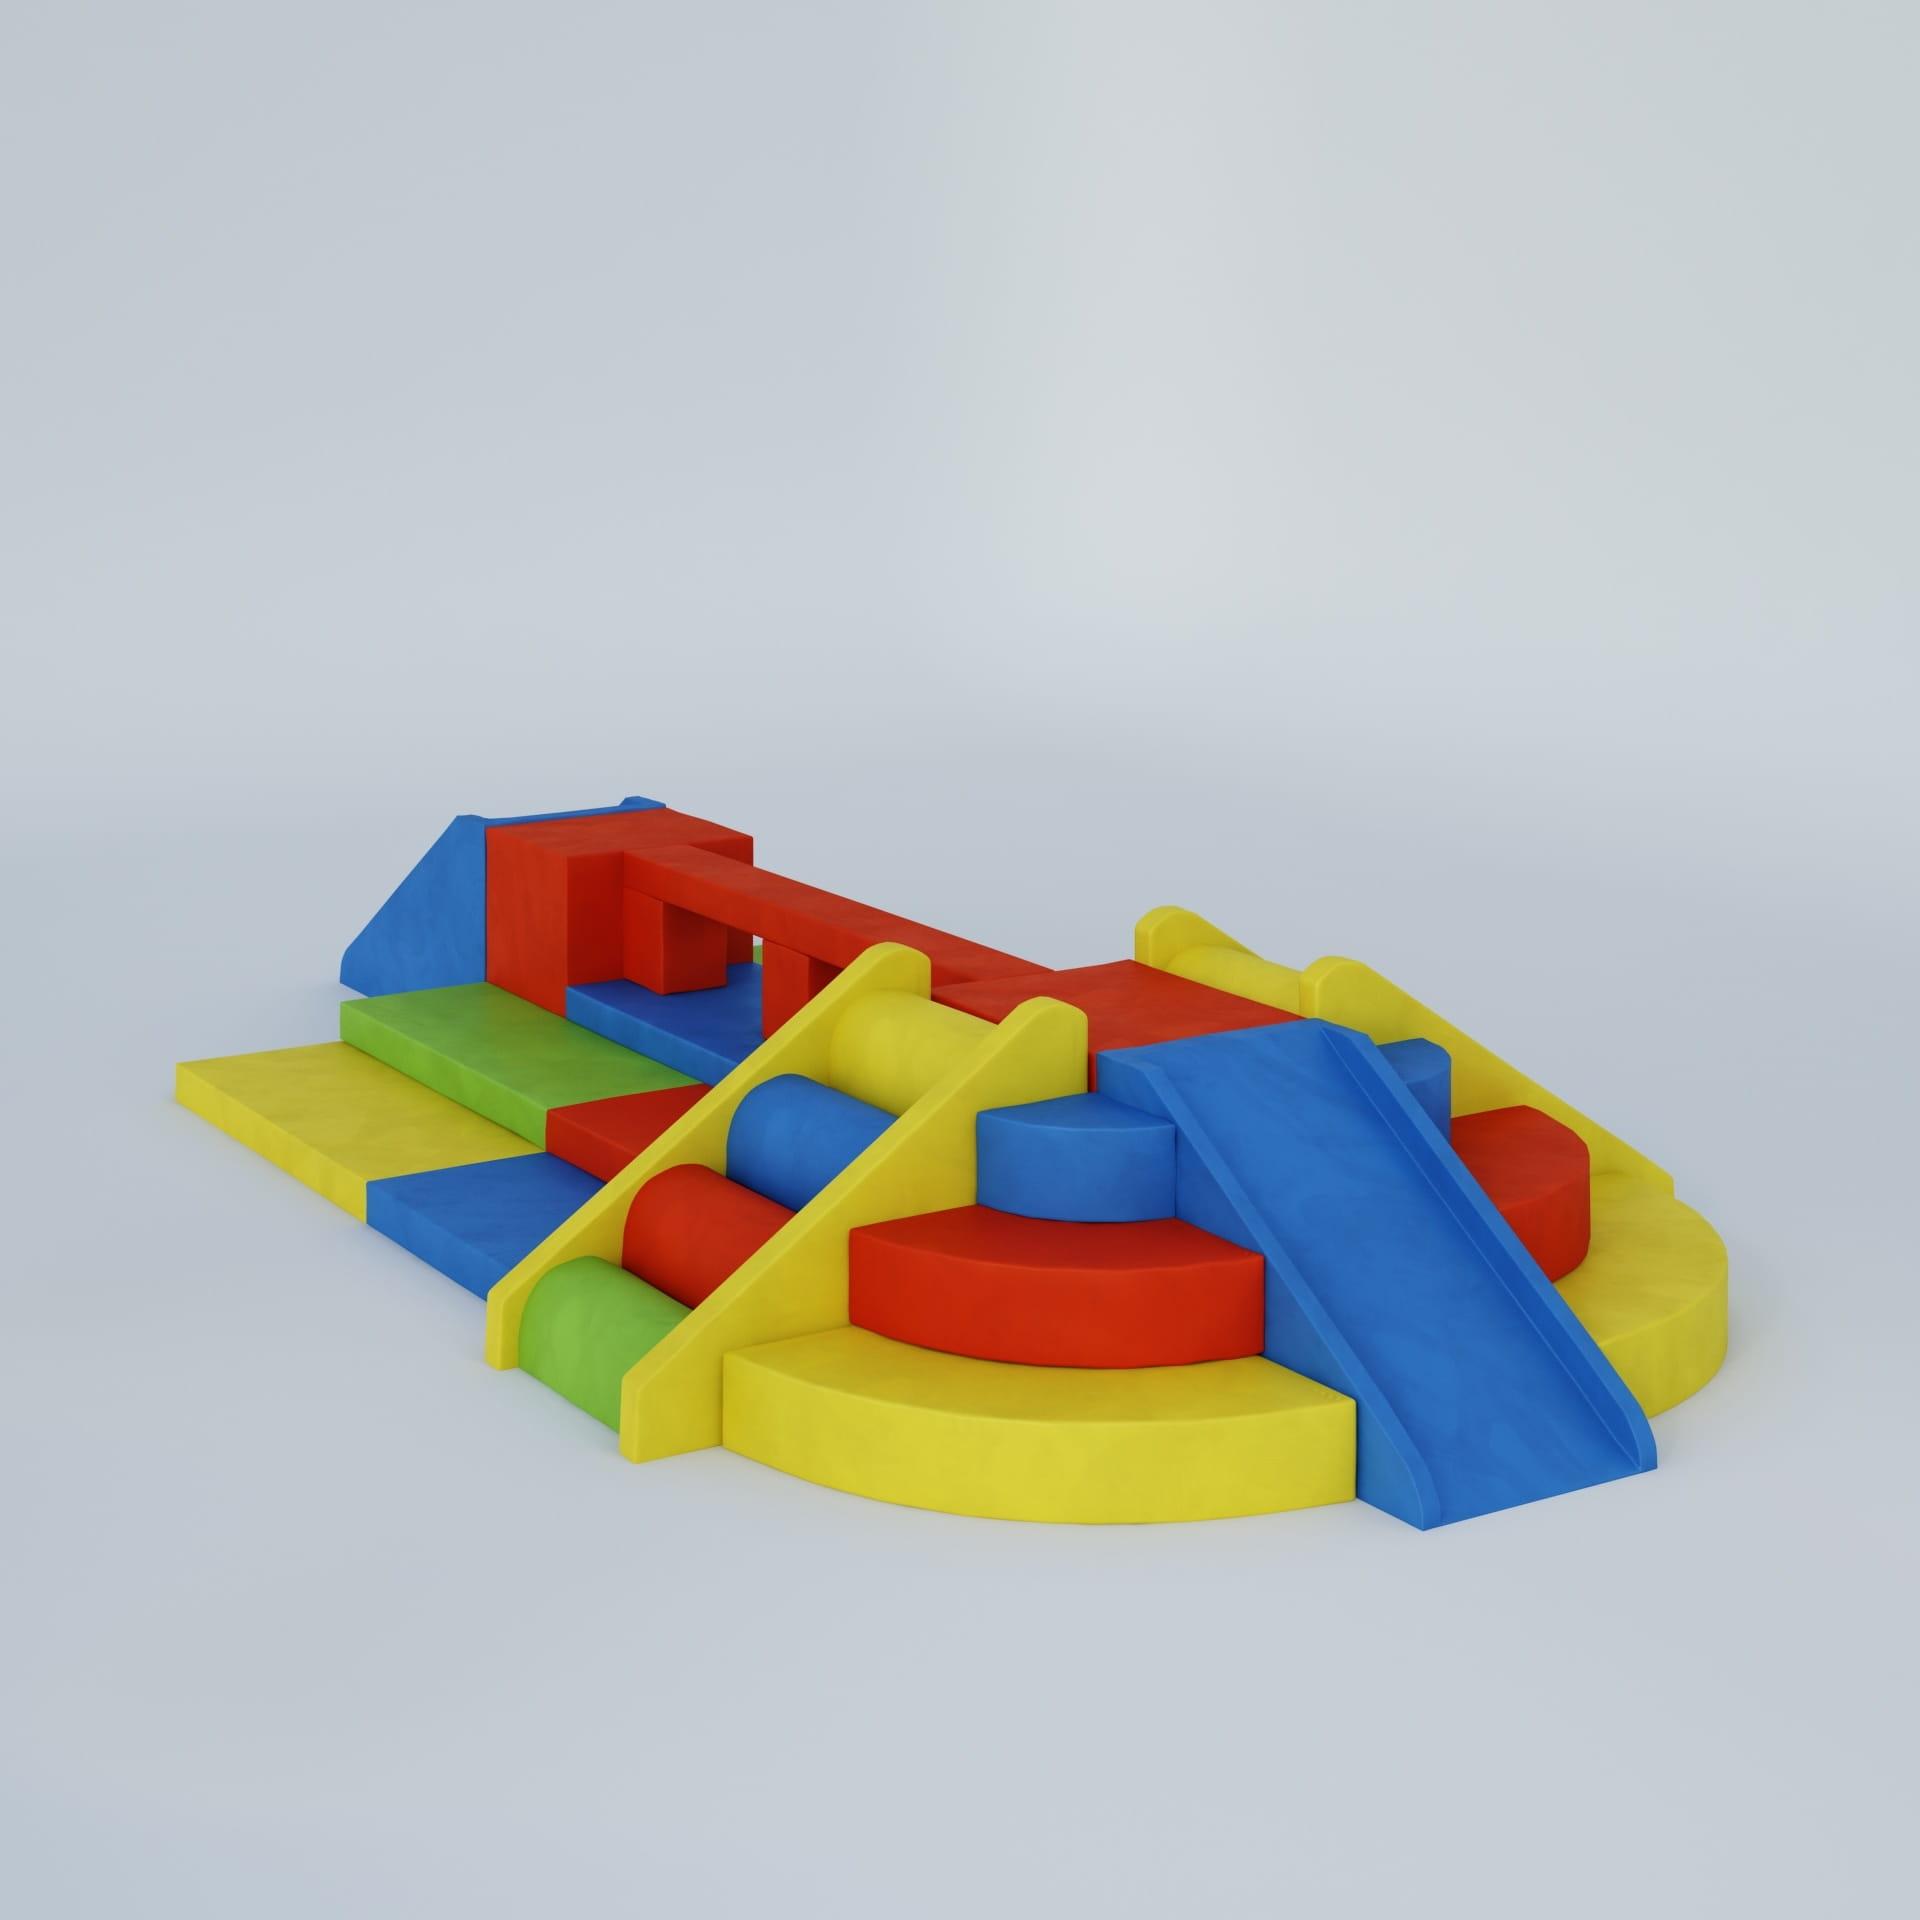 playground equipment 44 AM244 Archmodels